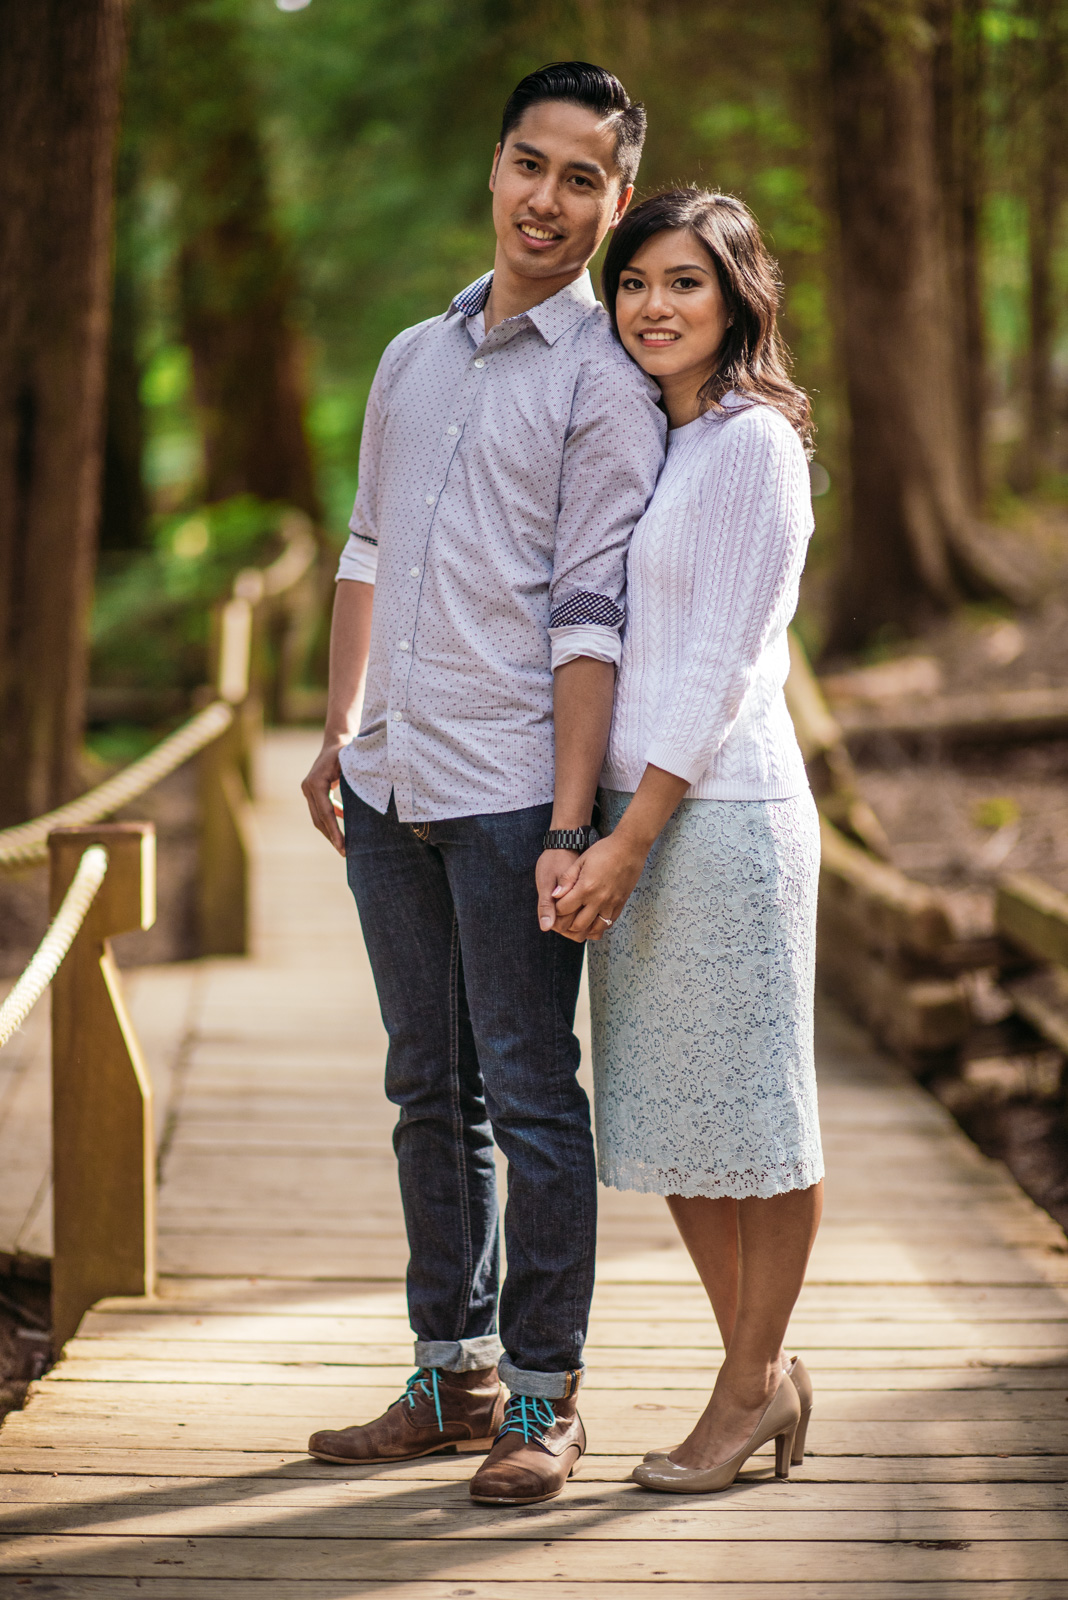 vancouver-island-wedding-photographers-capilano-suspension-bridge-engagement-18.jpg